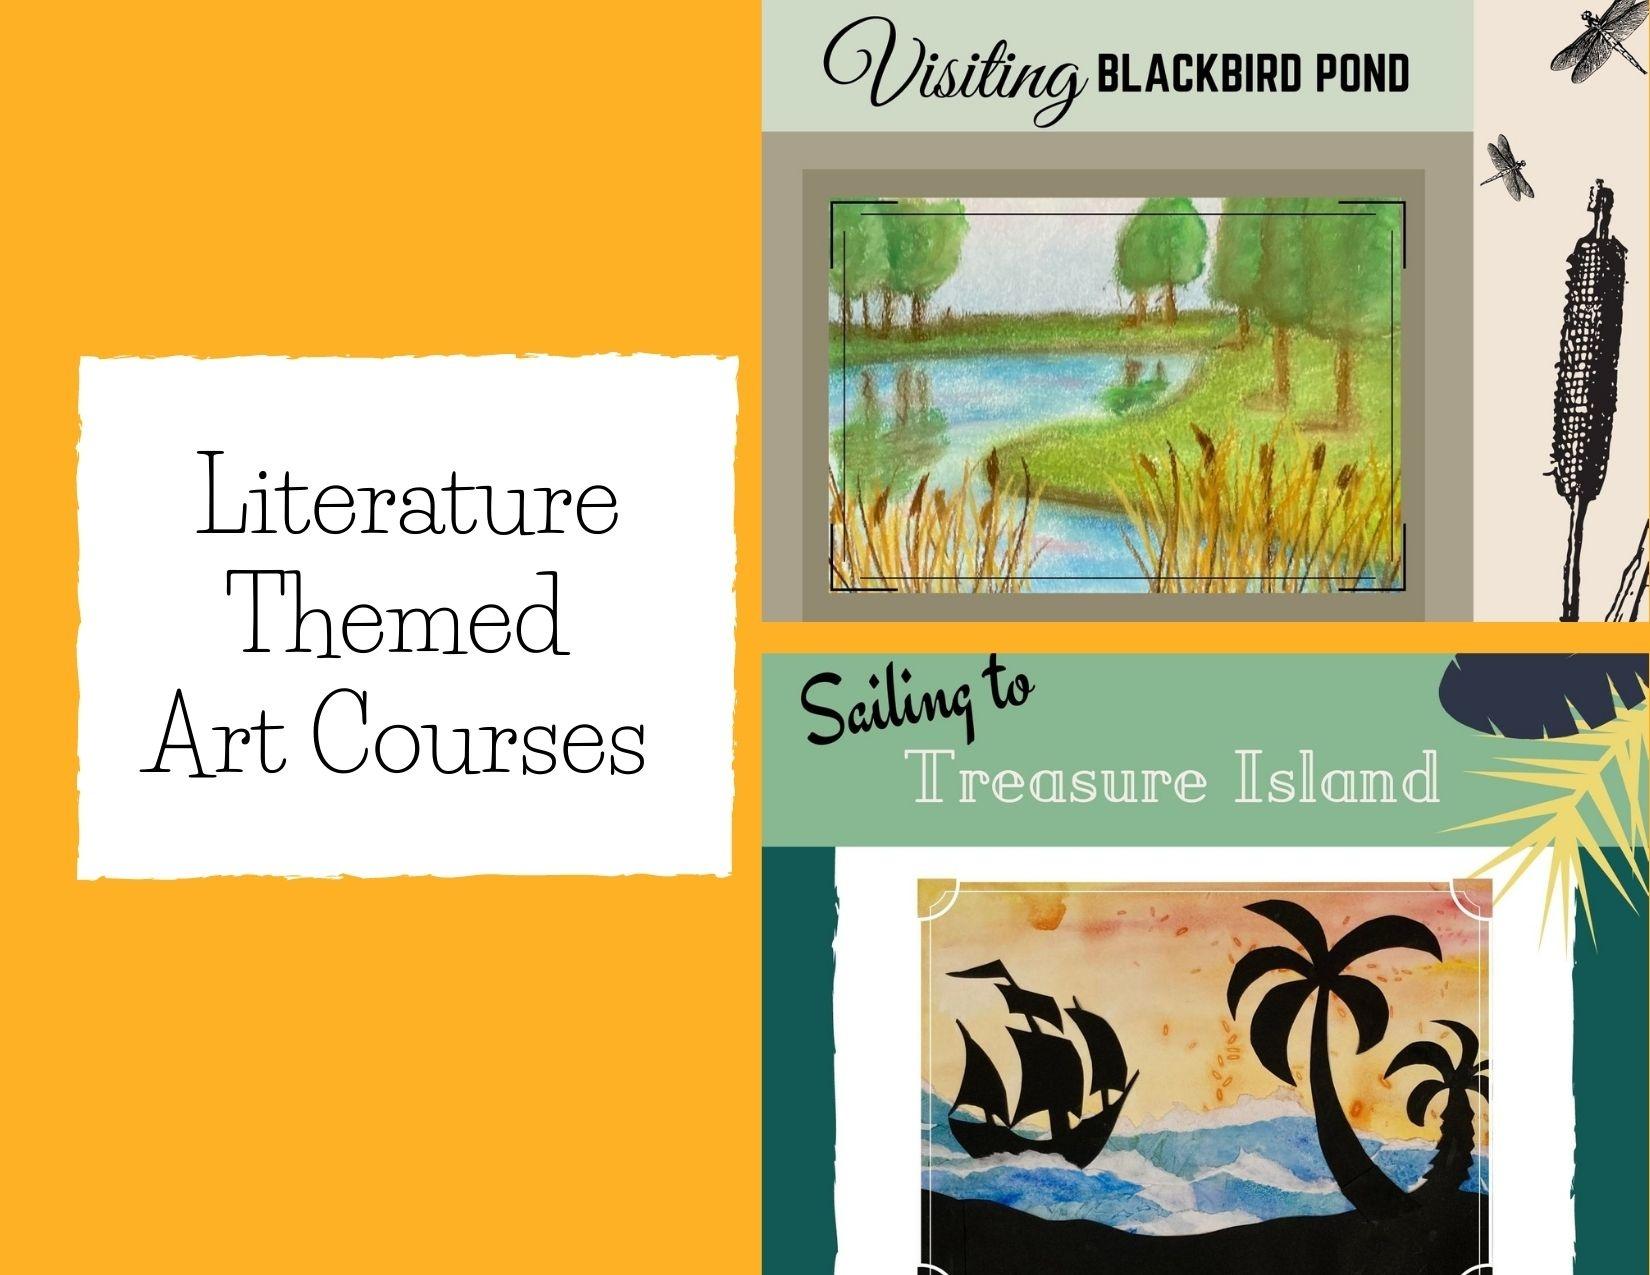 Literature Themed Art Courses